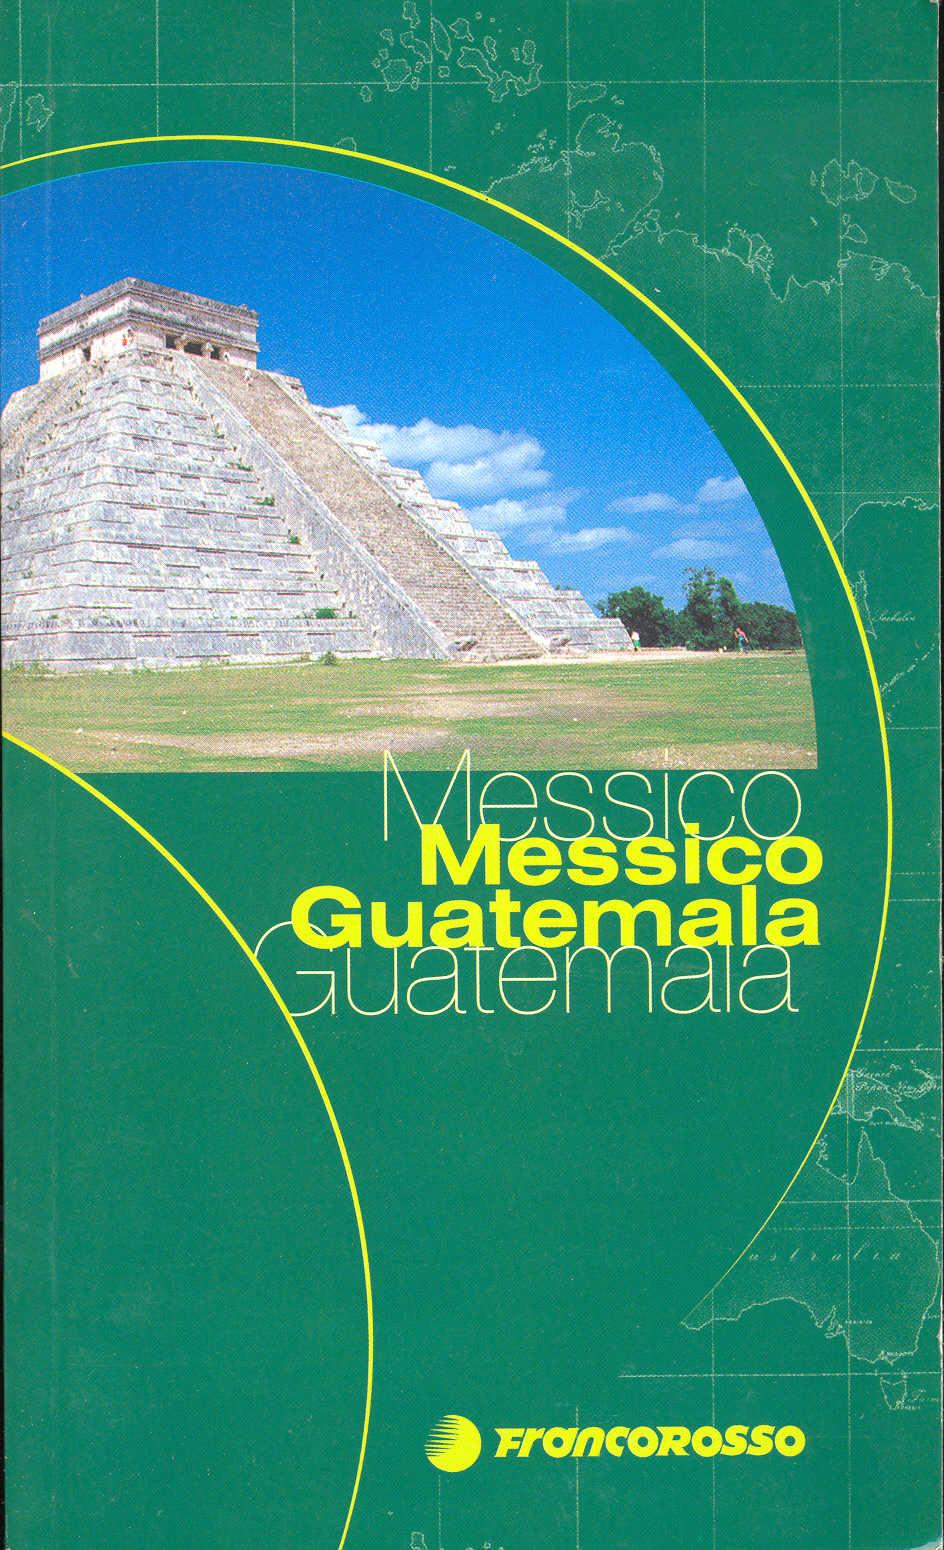 Messico Guatemala